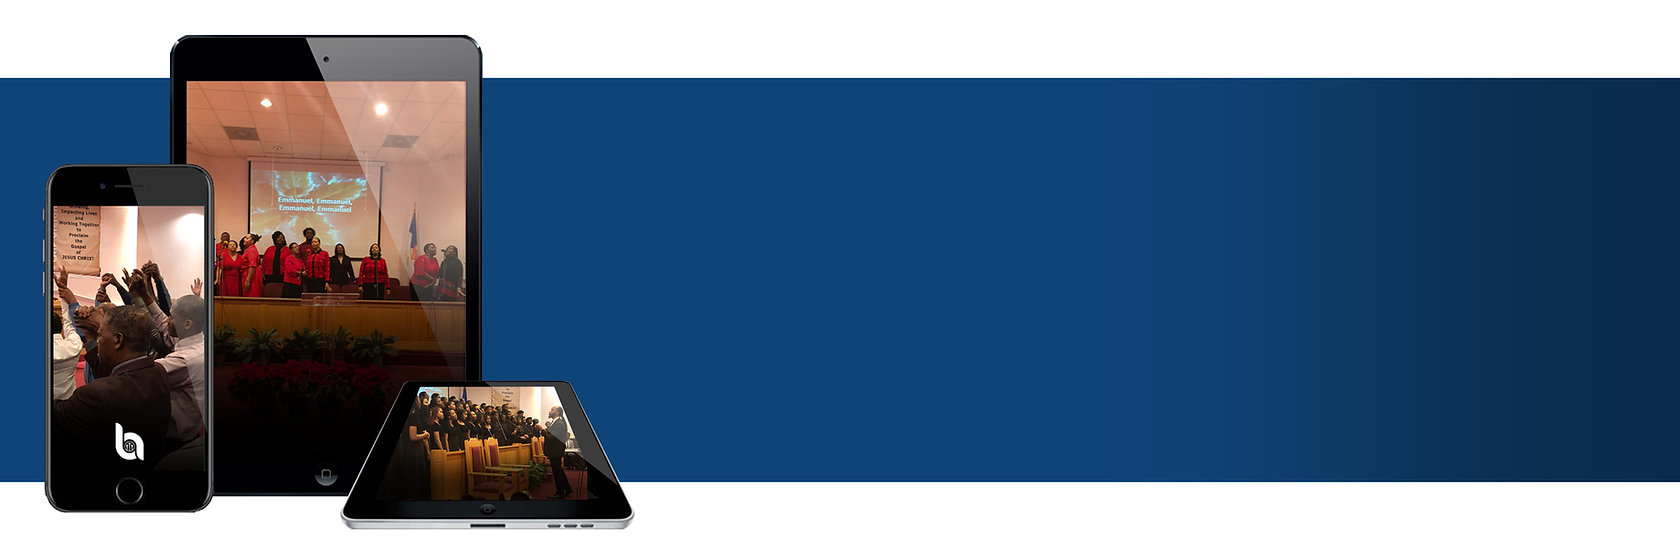 ATL_BLVD BLUE STRIP.jpg